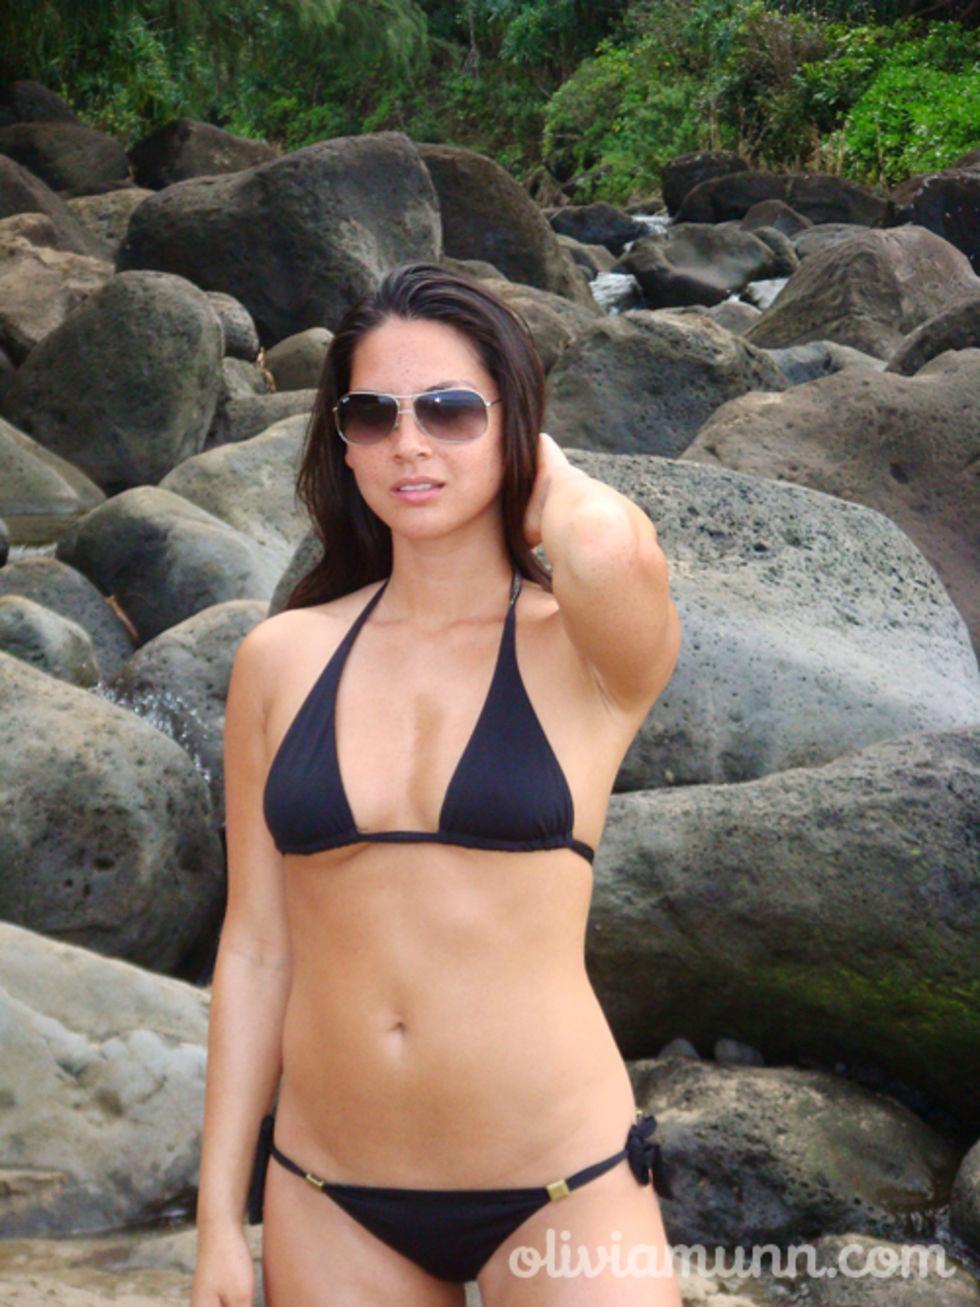 olivia-munn-bikini-candids-at-the-beach-in-hawaii-mq-01